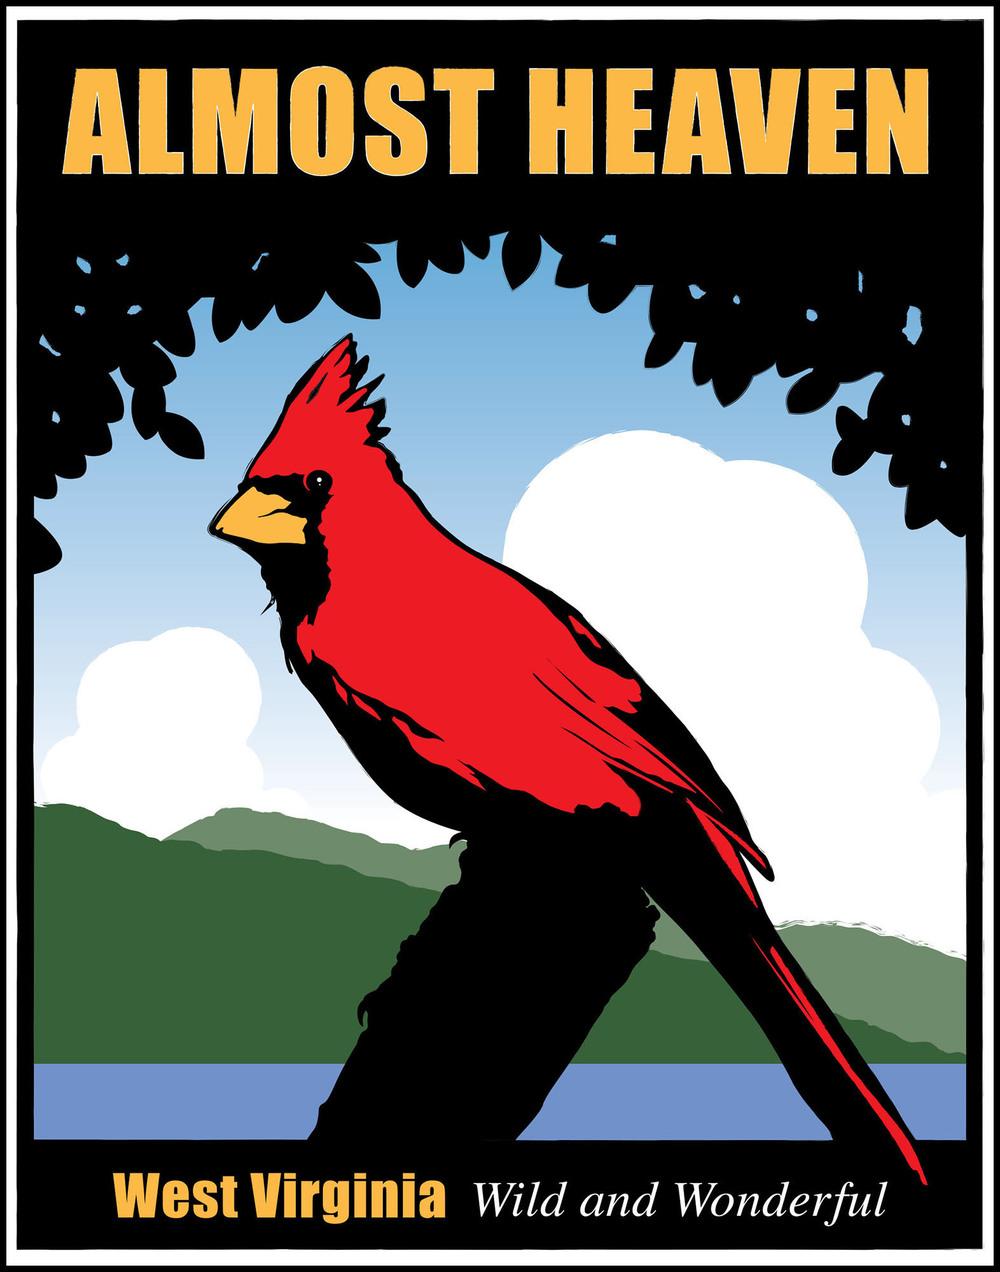 Almost Heaven_11 x 14.jpg